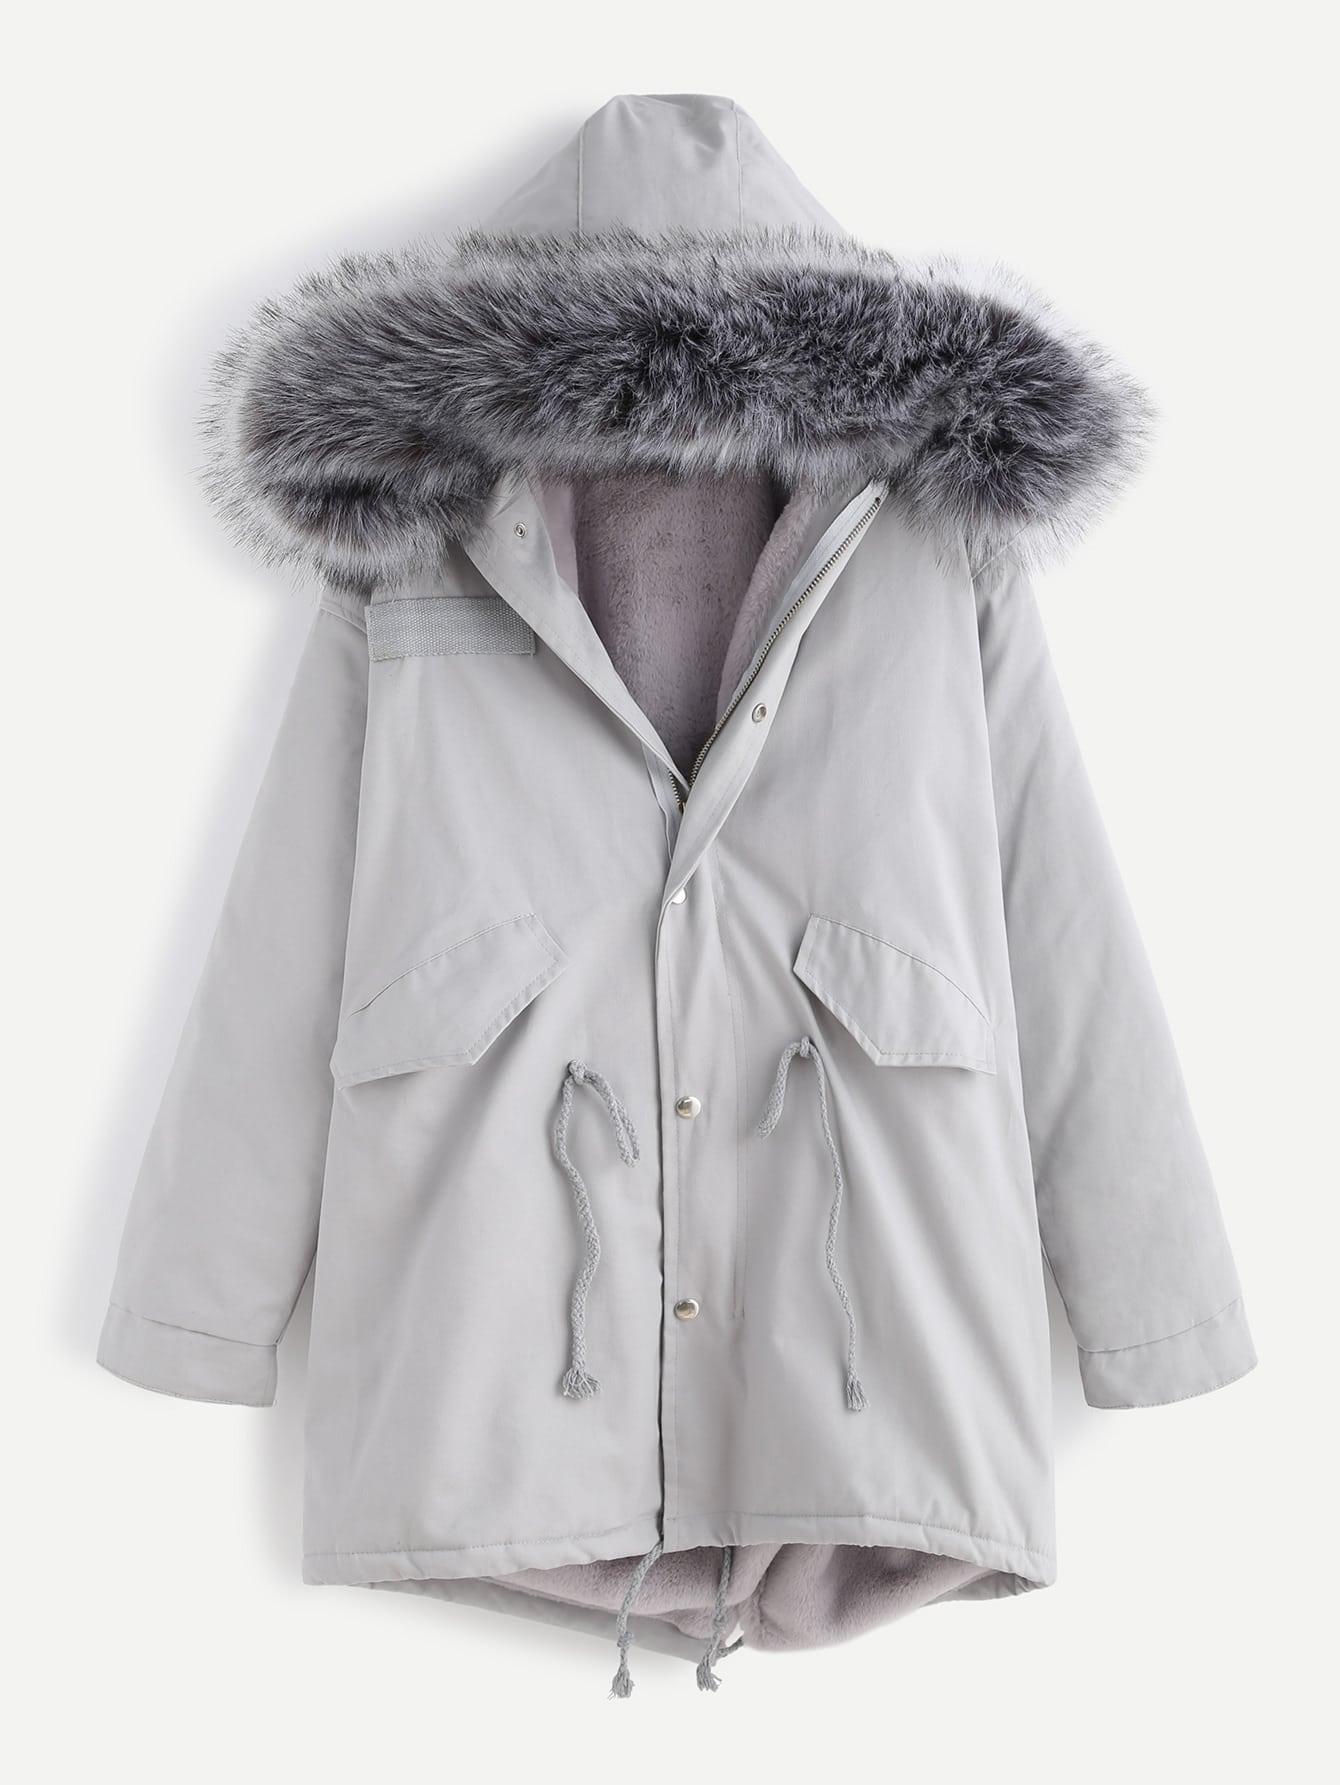 Gray And White Living Room Grey Faux Fur Trim Drawstring Fleece Inside Hooded Coatfor